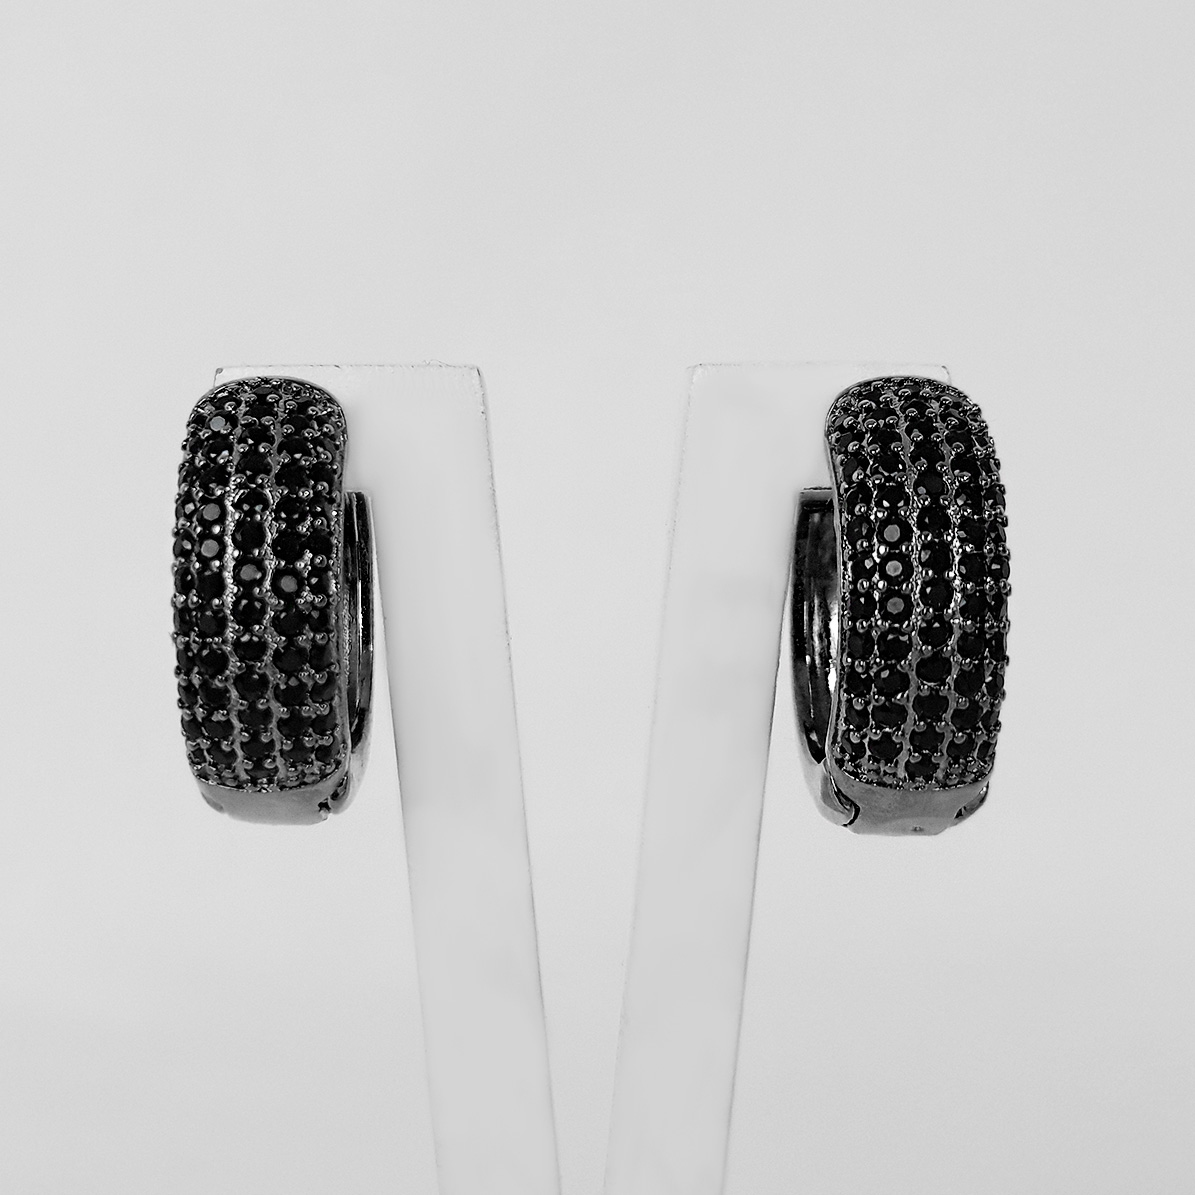 Brinco Argola 5 Filetes de Zircônias Banho Ródio Negro  - Lunozê Joias